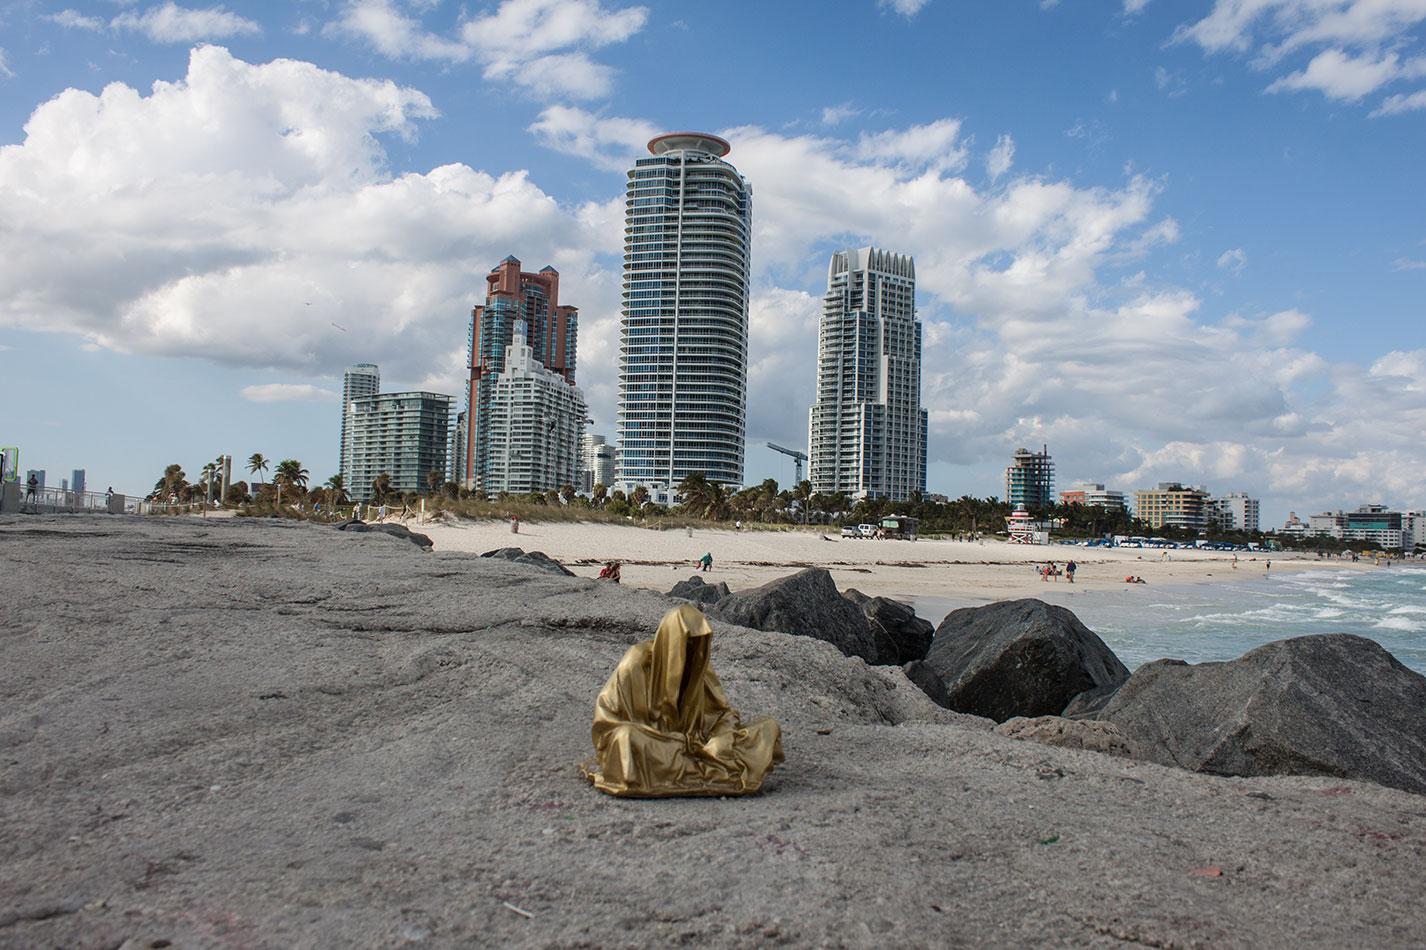 public-art-basel-miami-beach-fair-usa-florida-guardians-of-time-manfred-kili-kielnhofer-contemporary-fine-art-modern-arts-design-antiques-sculpture-6893